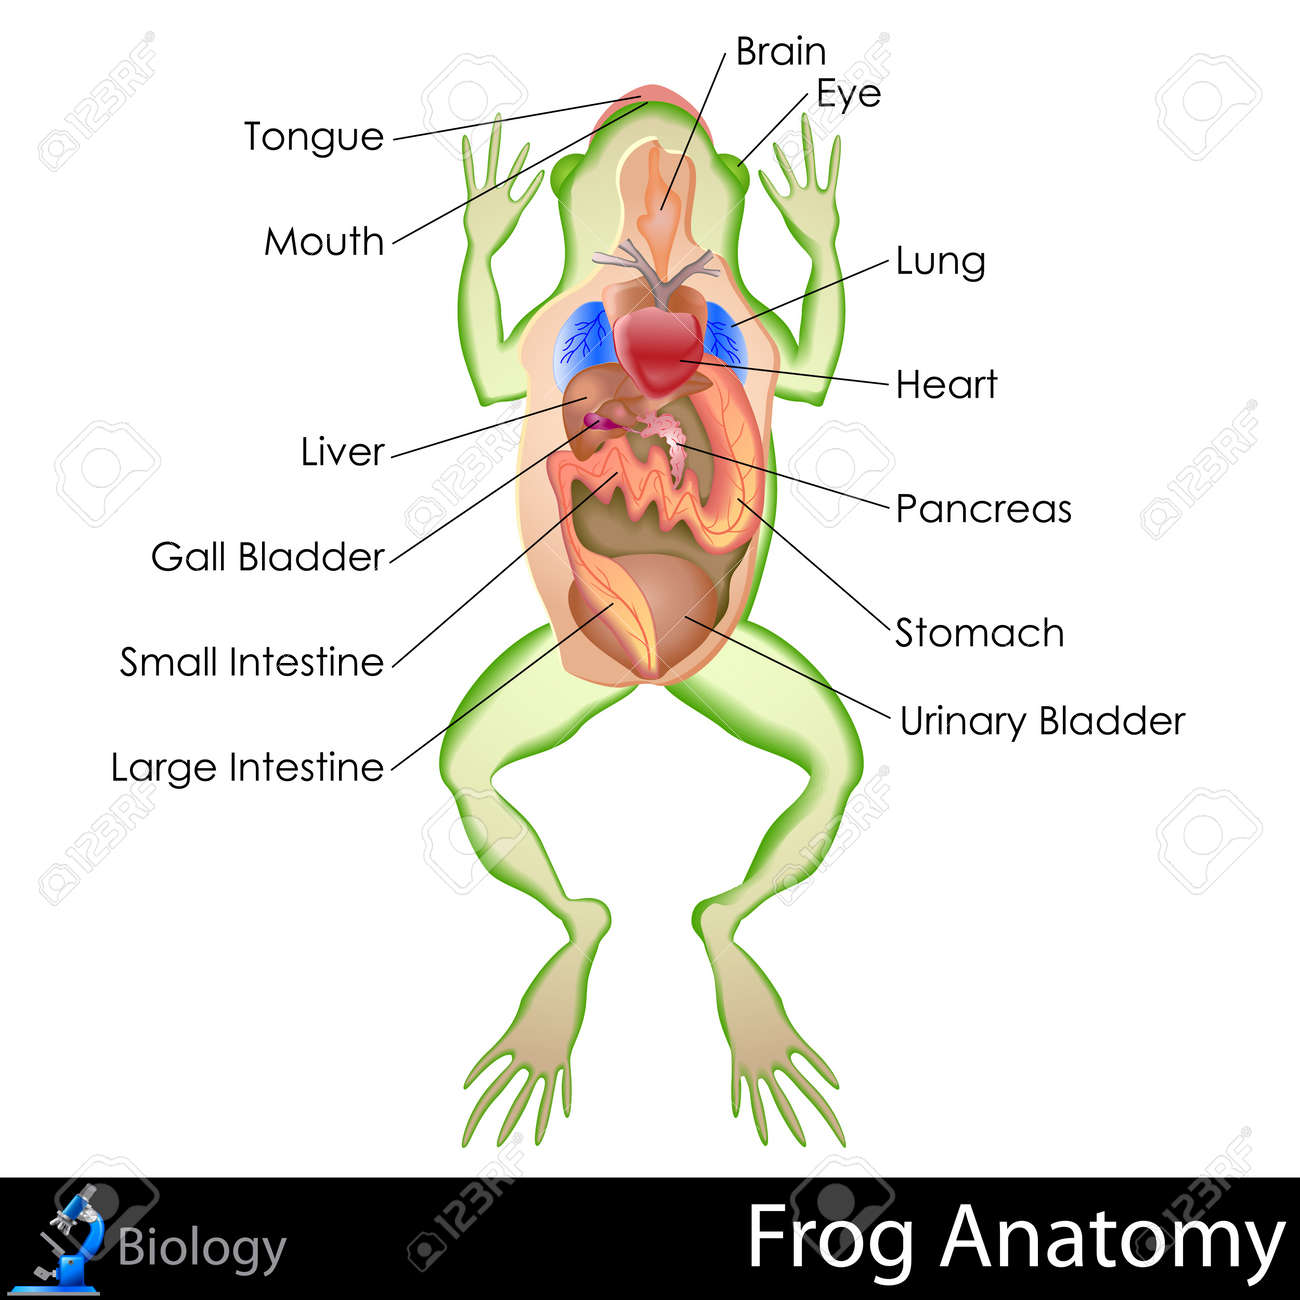 Frog Anatomy Mouth Frog Anatomy